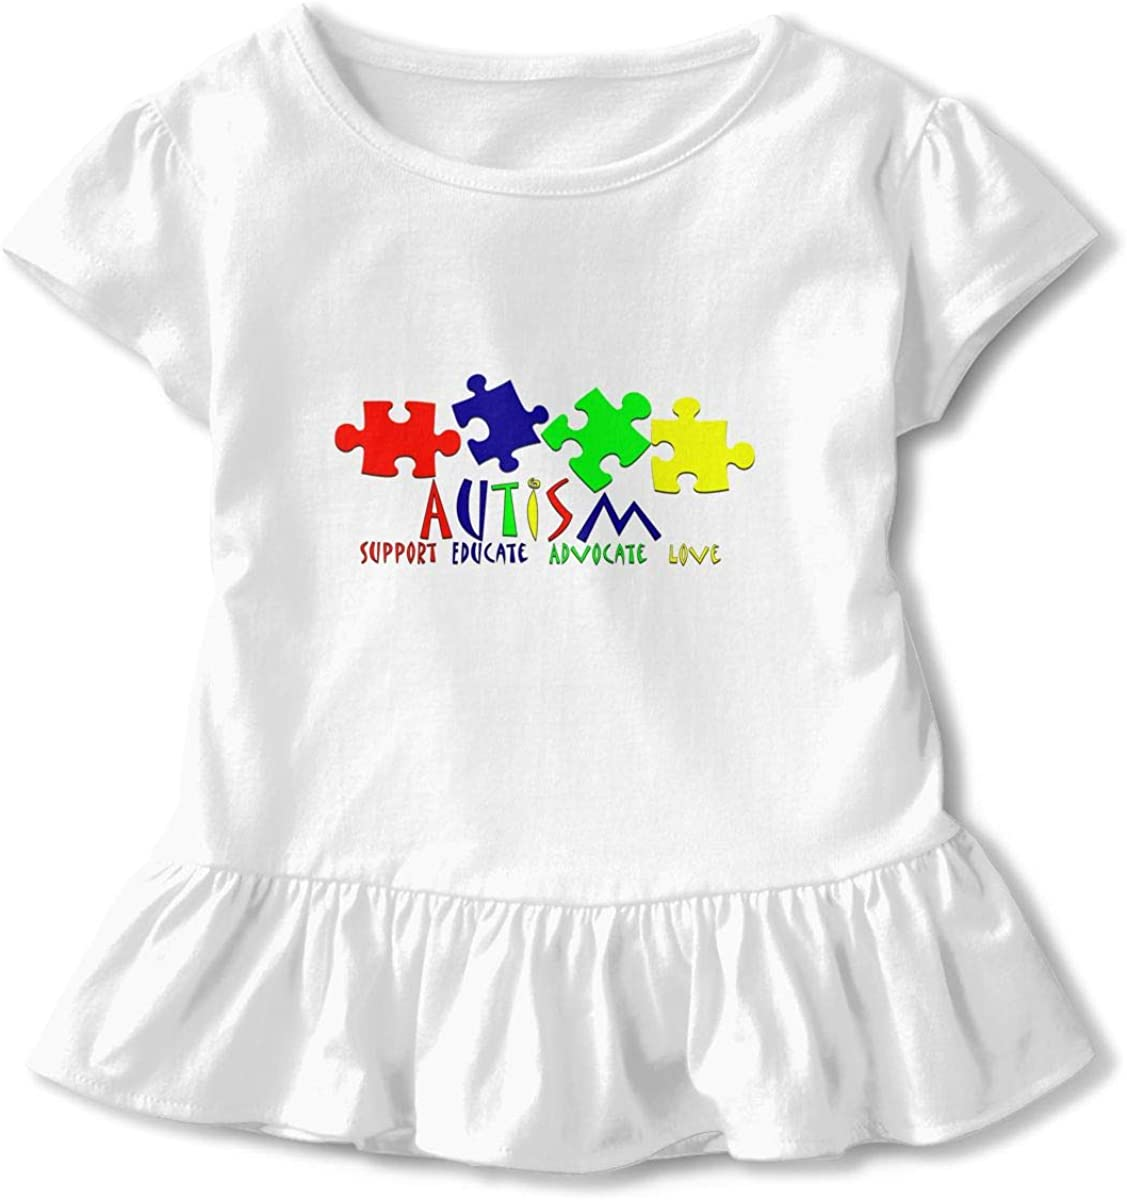 Autism Love Toddler//Infant Girls Short Sleeve Ruffles Shirt T-Shirt for 2-6T